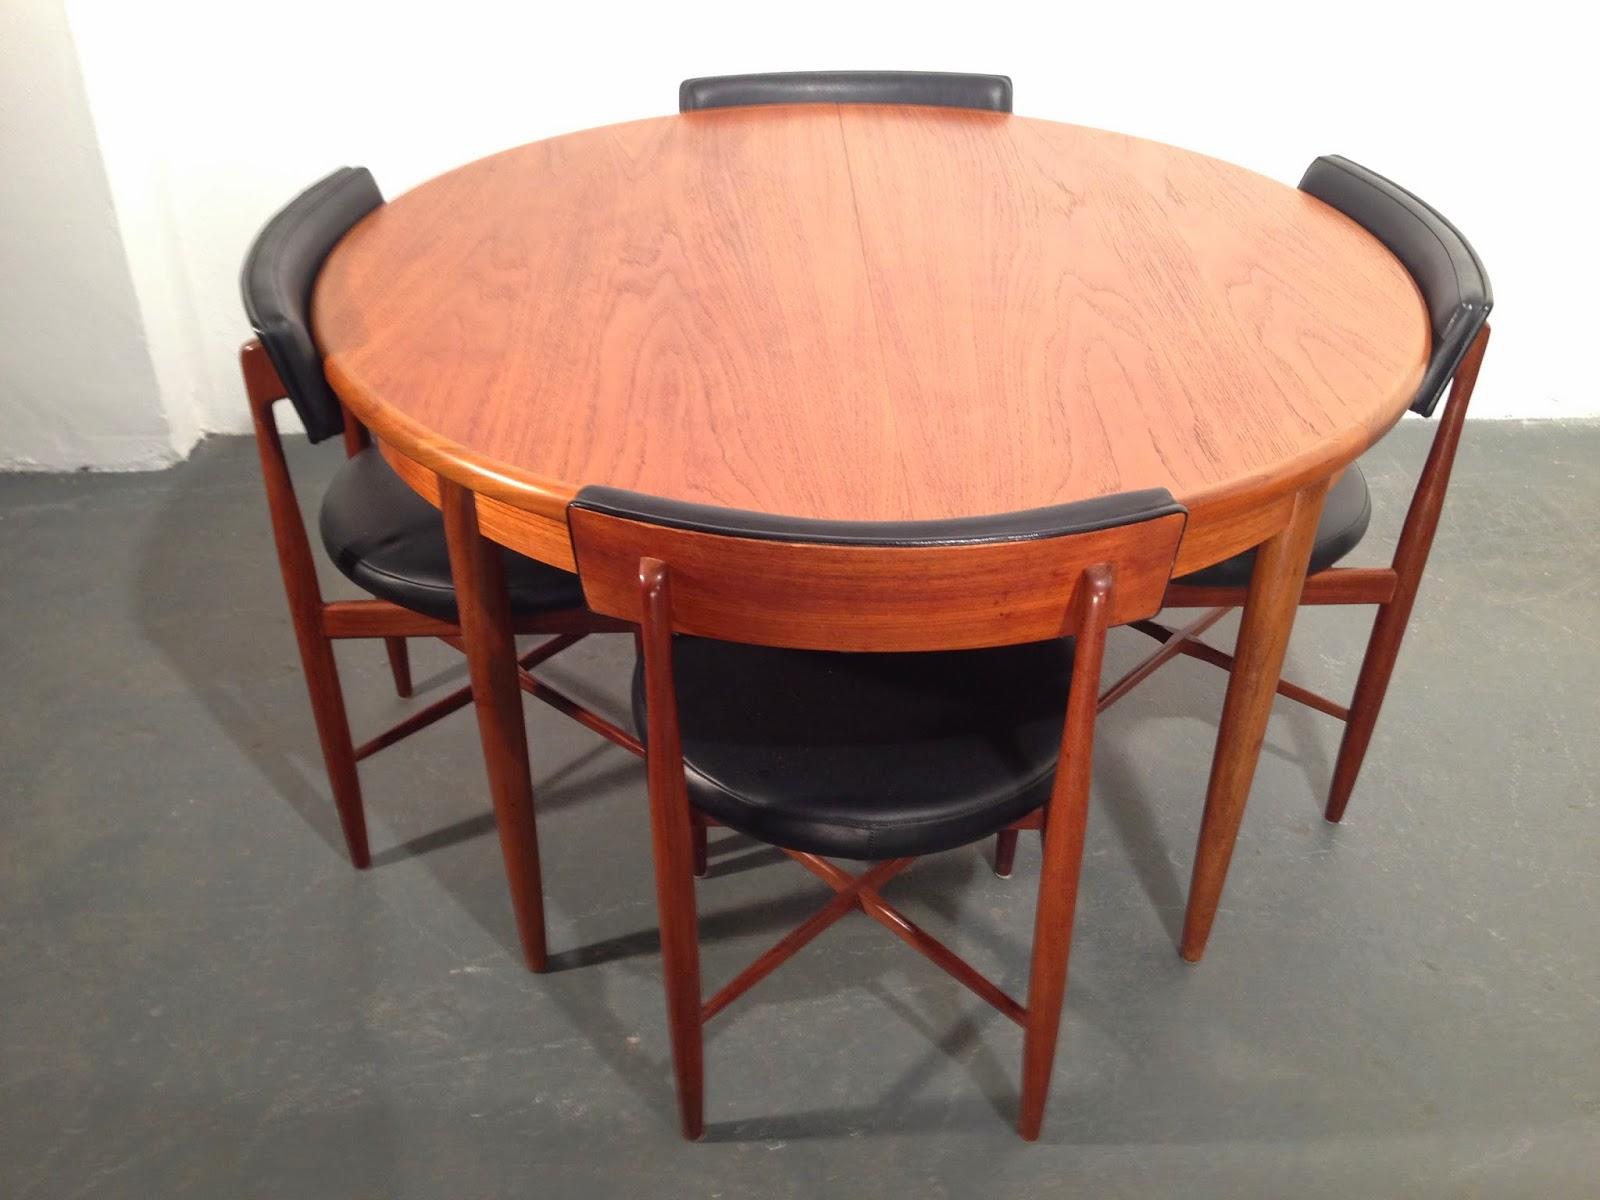 Ocd vintage furniture ireland g plan dining set 1970s for G plan dining room furniture